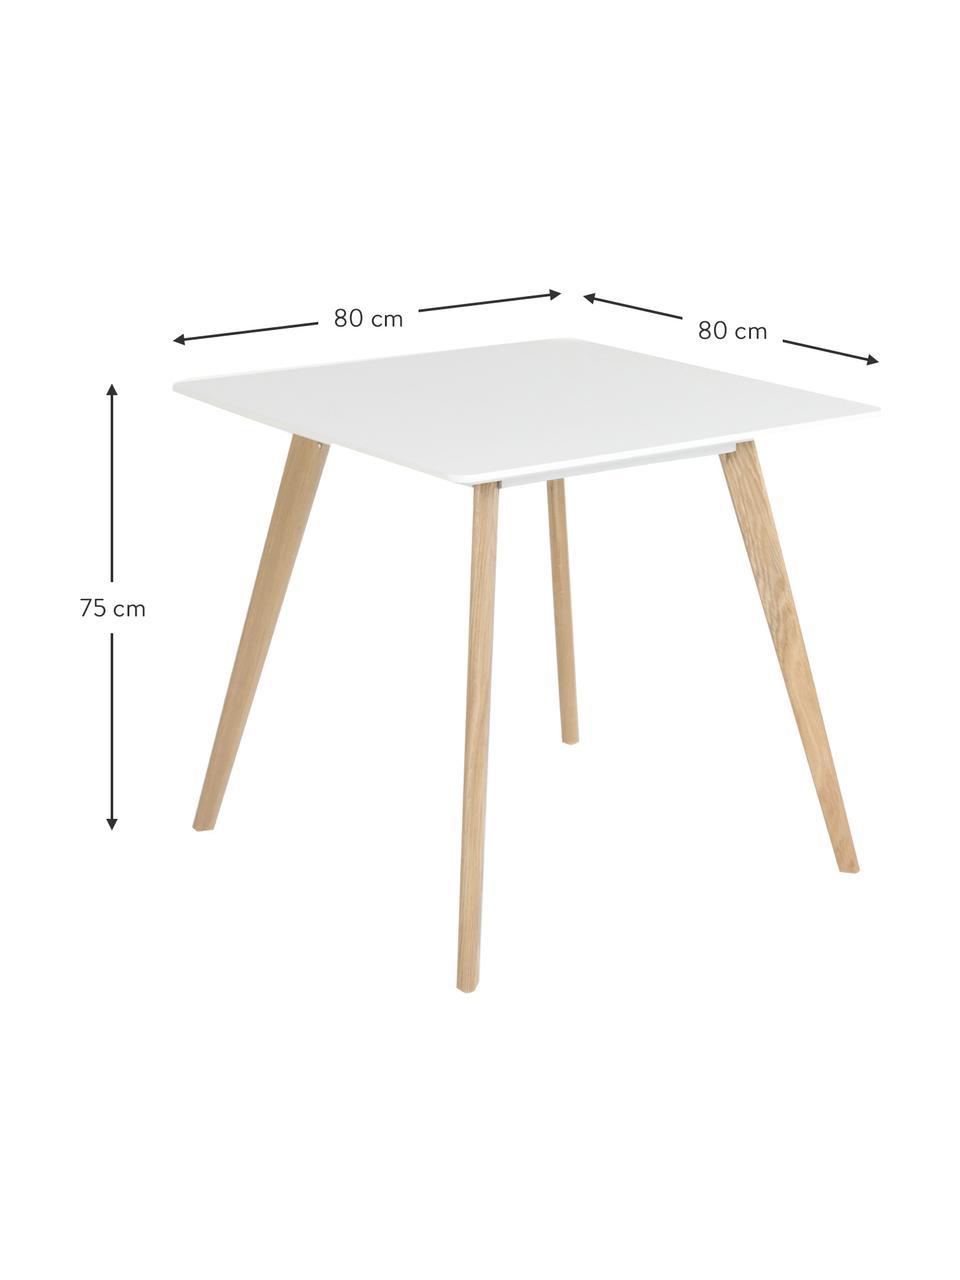 Petite table scandinave Flamy, 80 x 80 cm, Blanc